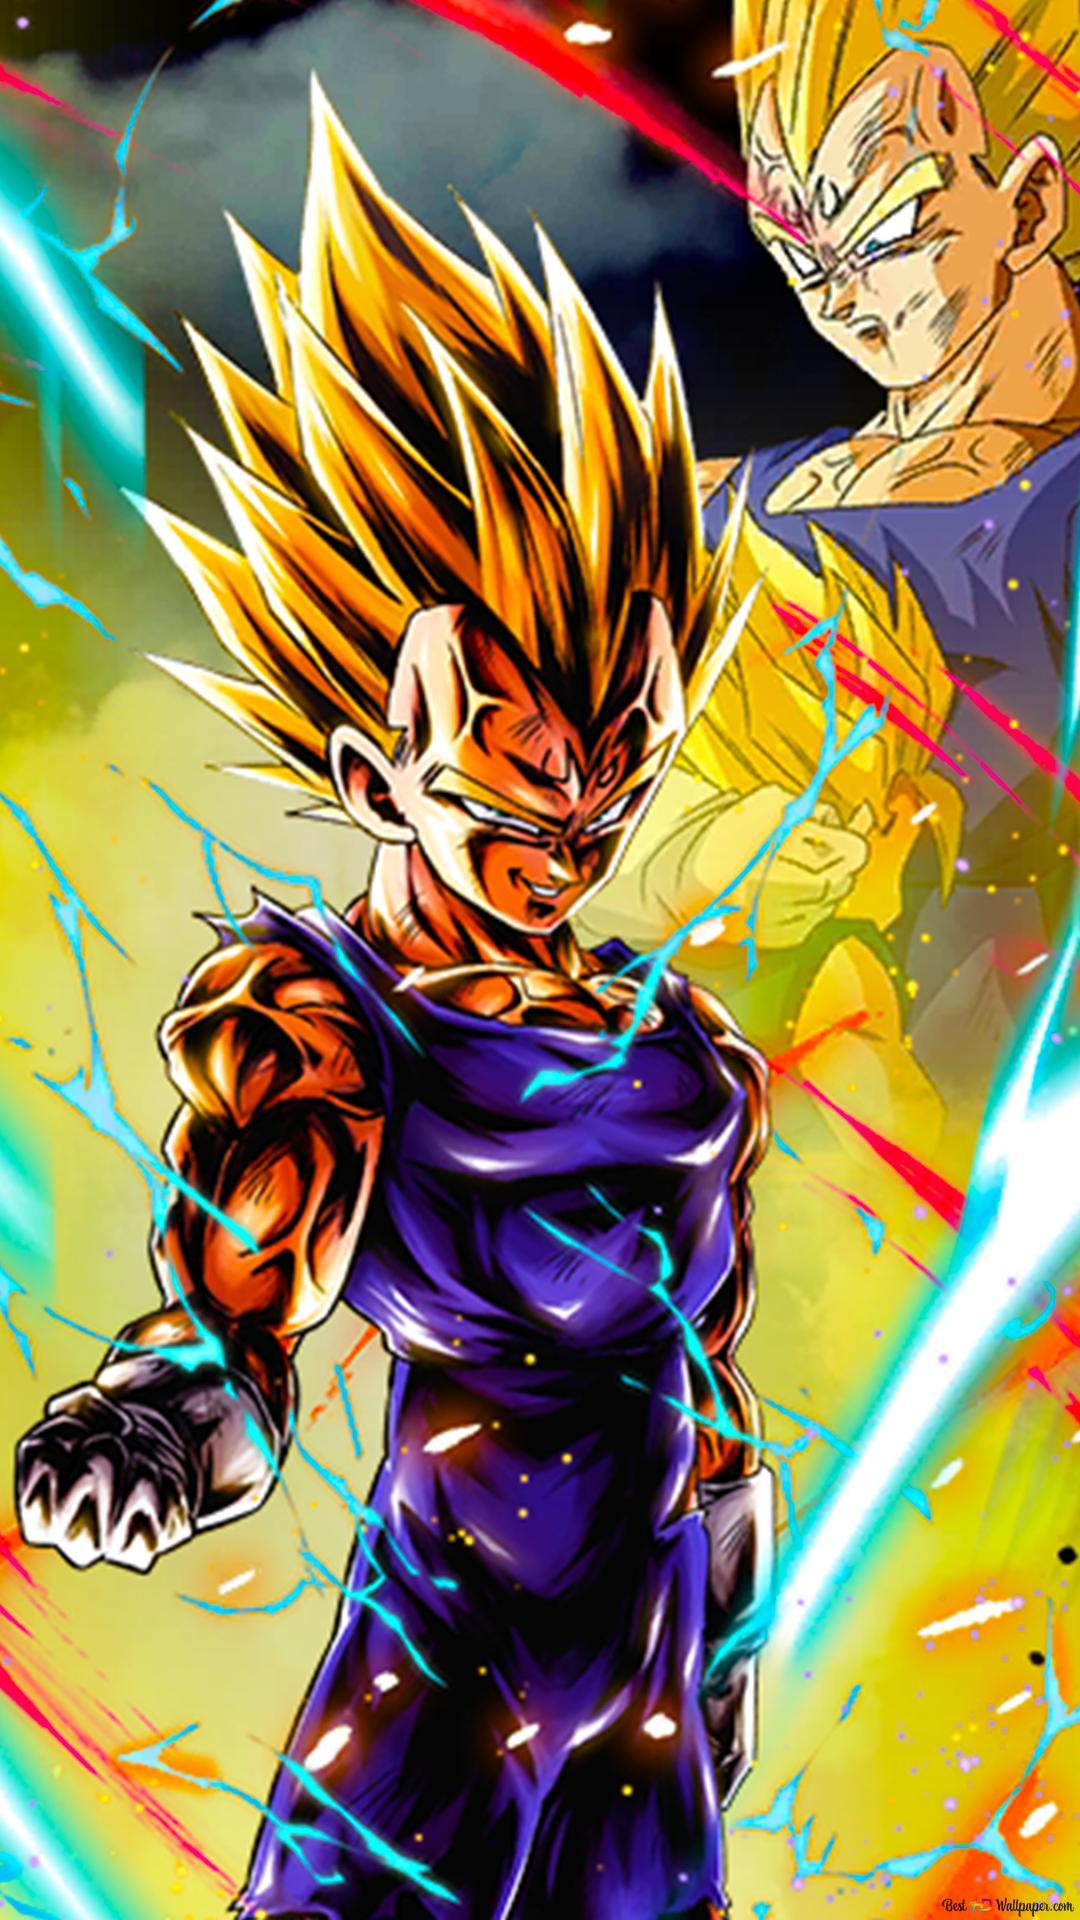 Majin Vegeta From Dragon Ball Z Dragon Ball Legends Arts For Desktop Hd Wallpaper Download